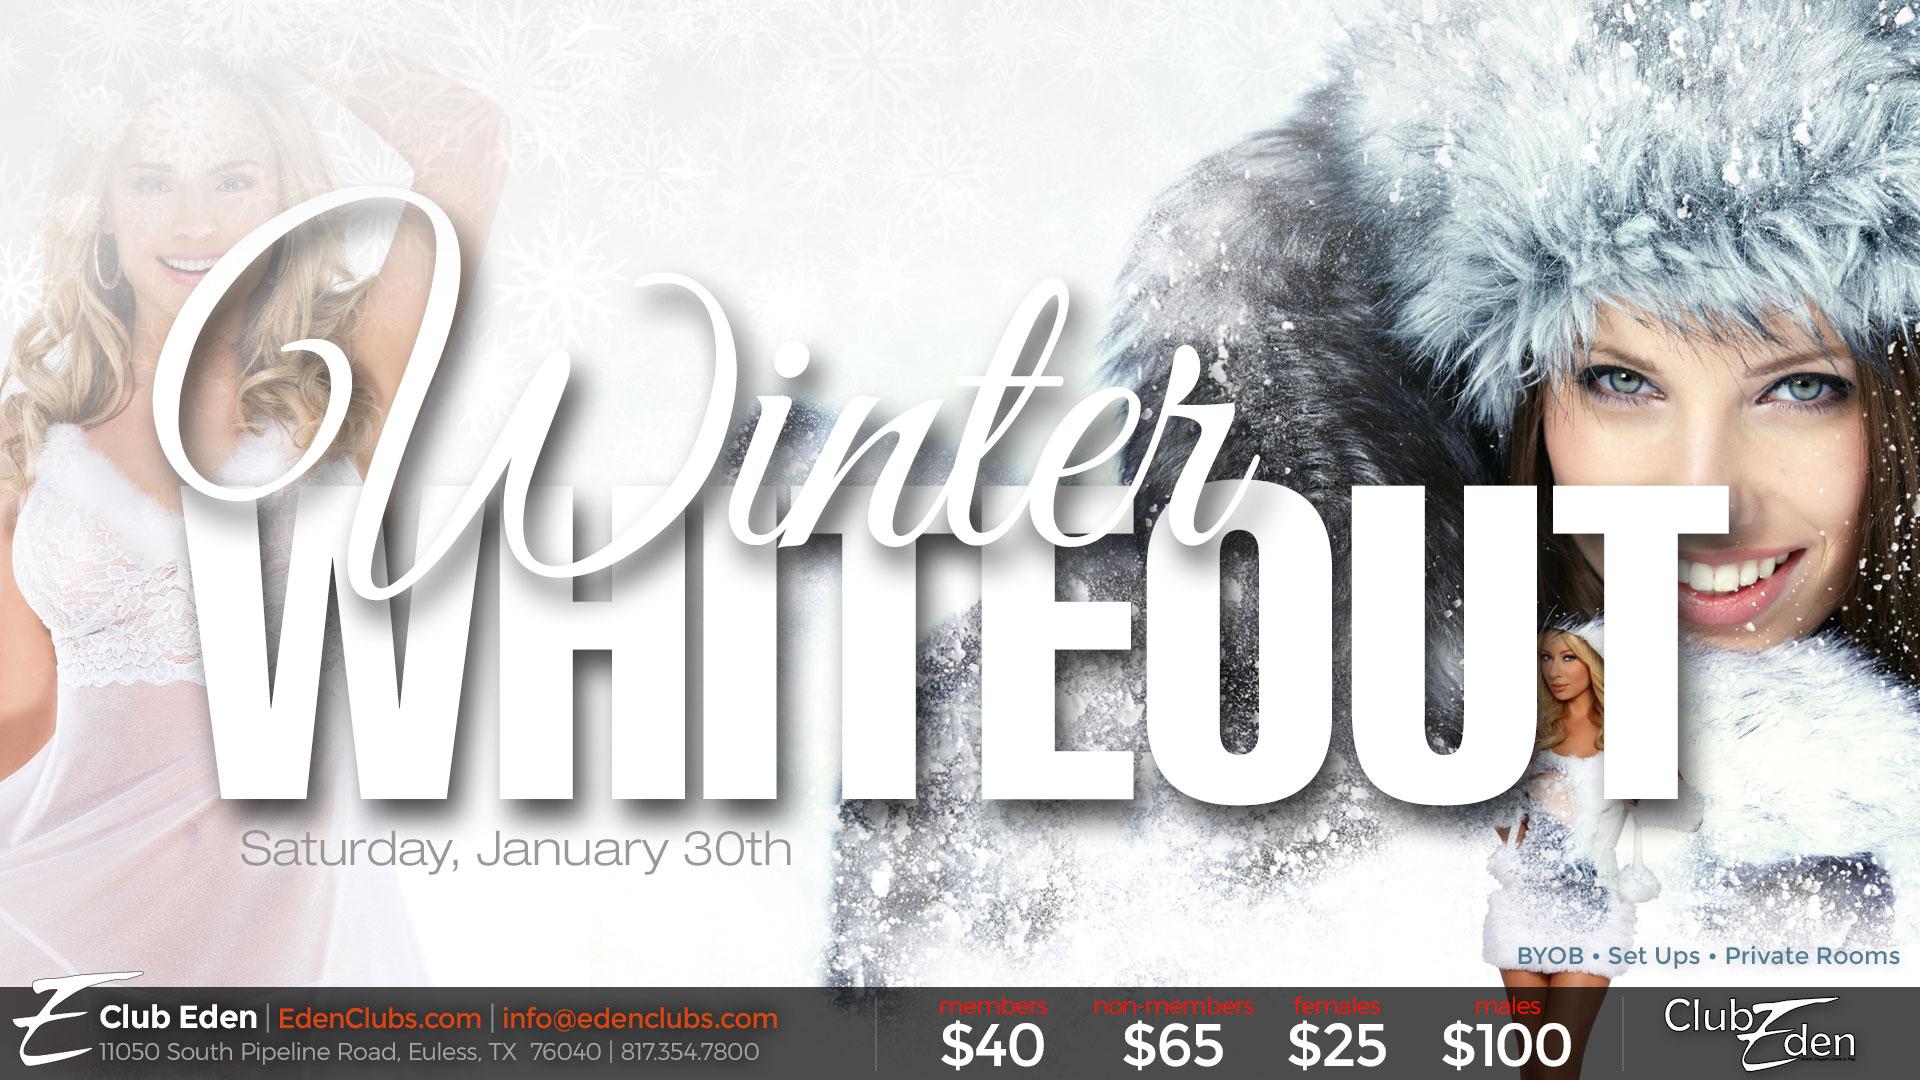 013021-Winter-Whiteout-tv